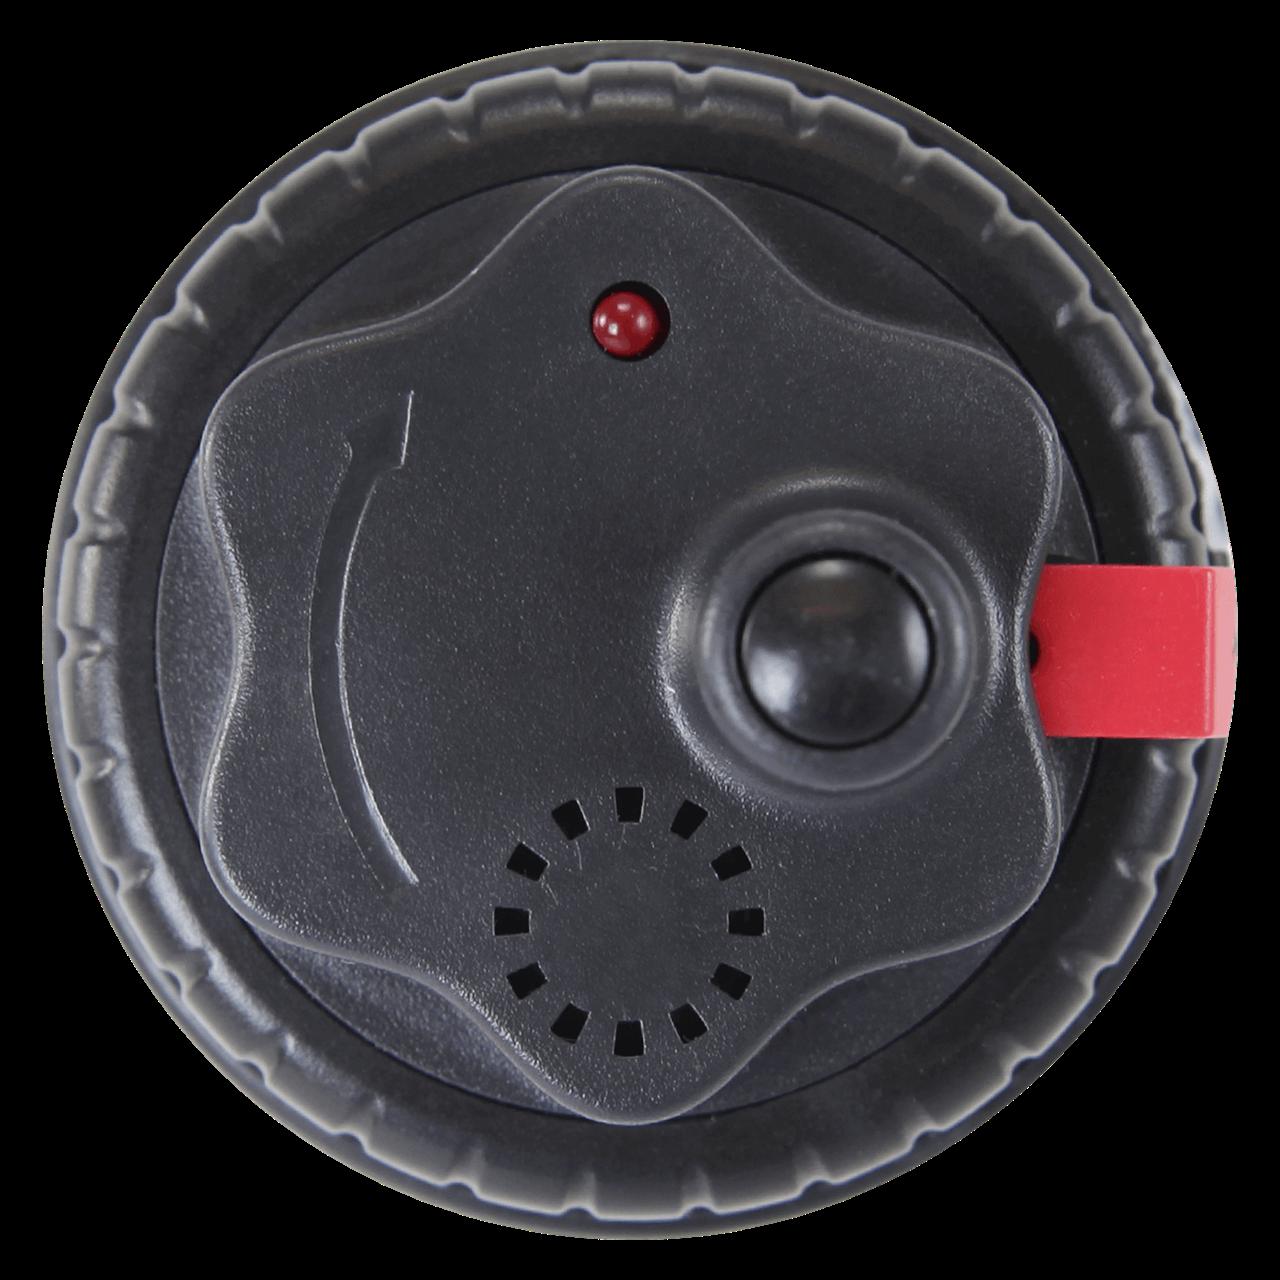 Sensormatic Magnetic Alarming 2-Tone Wrap Vantag Armenia